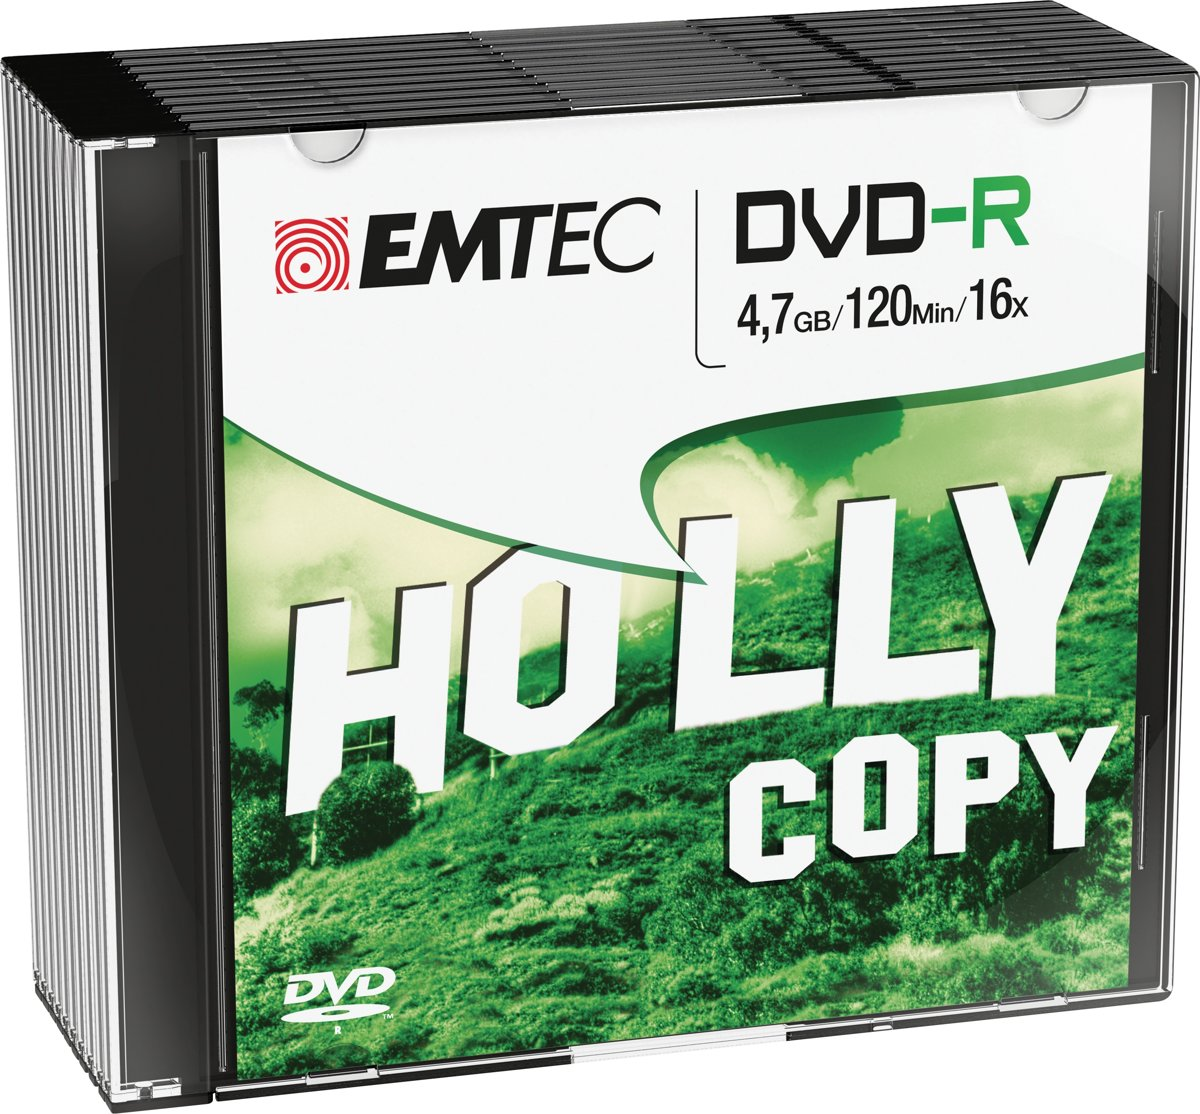 DVD-R Emtec 4,7GB  10pcs 16x Slim NEW PACKAGING